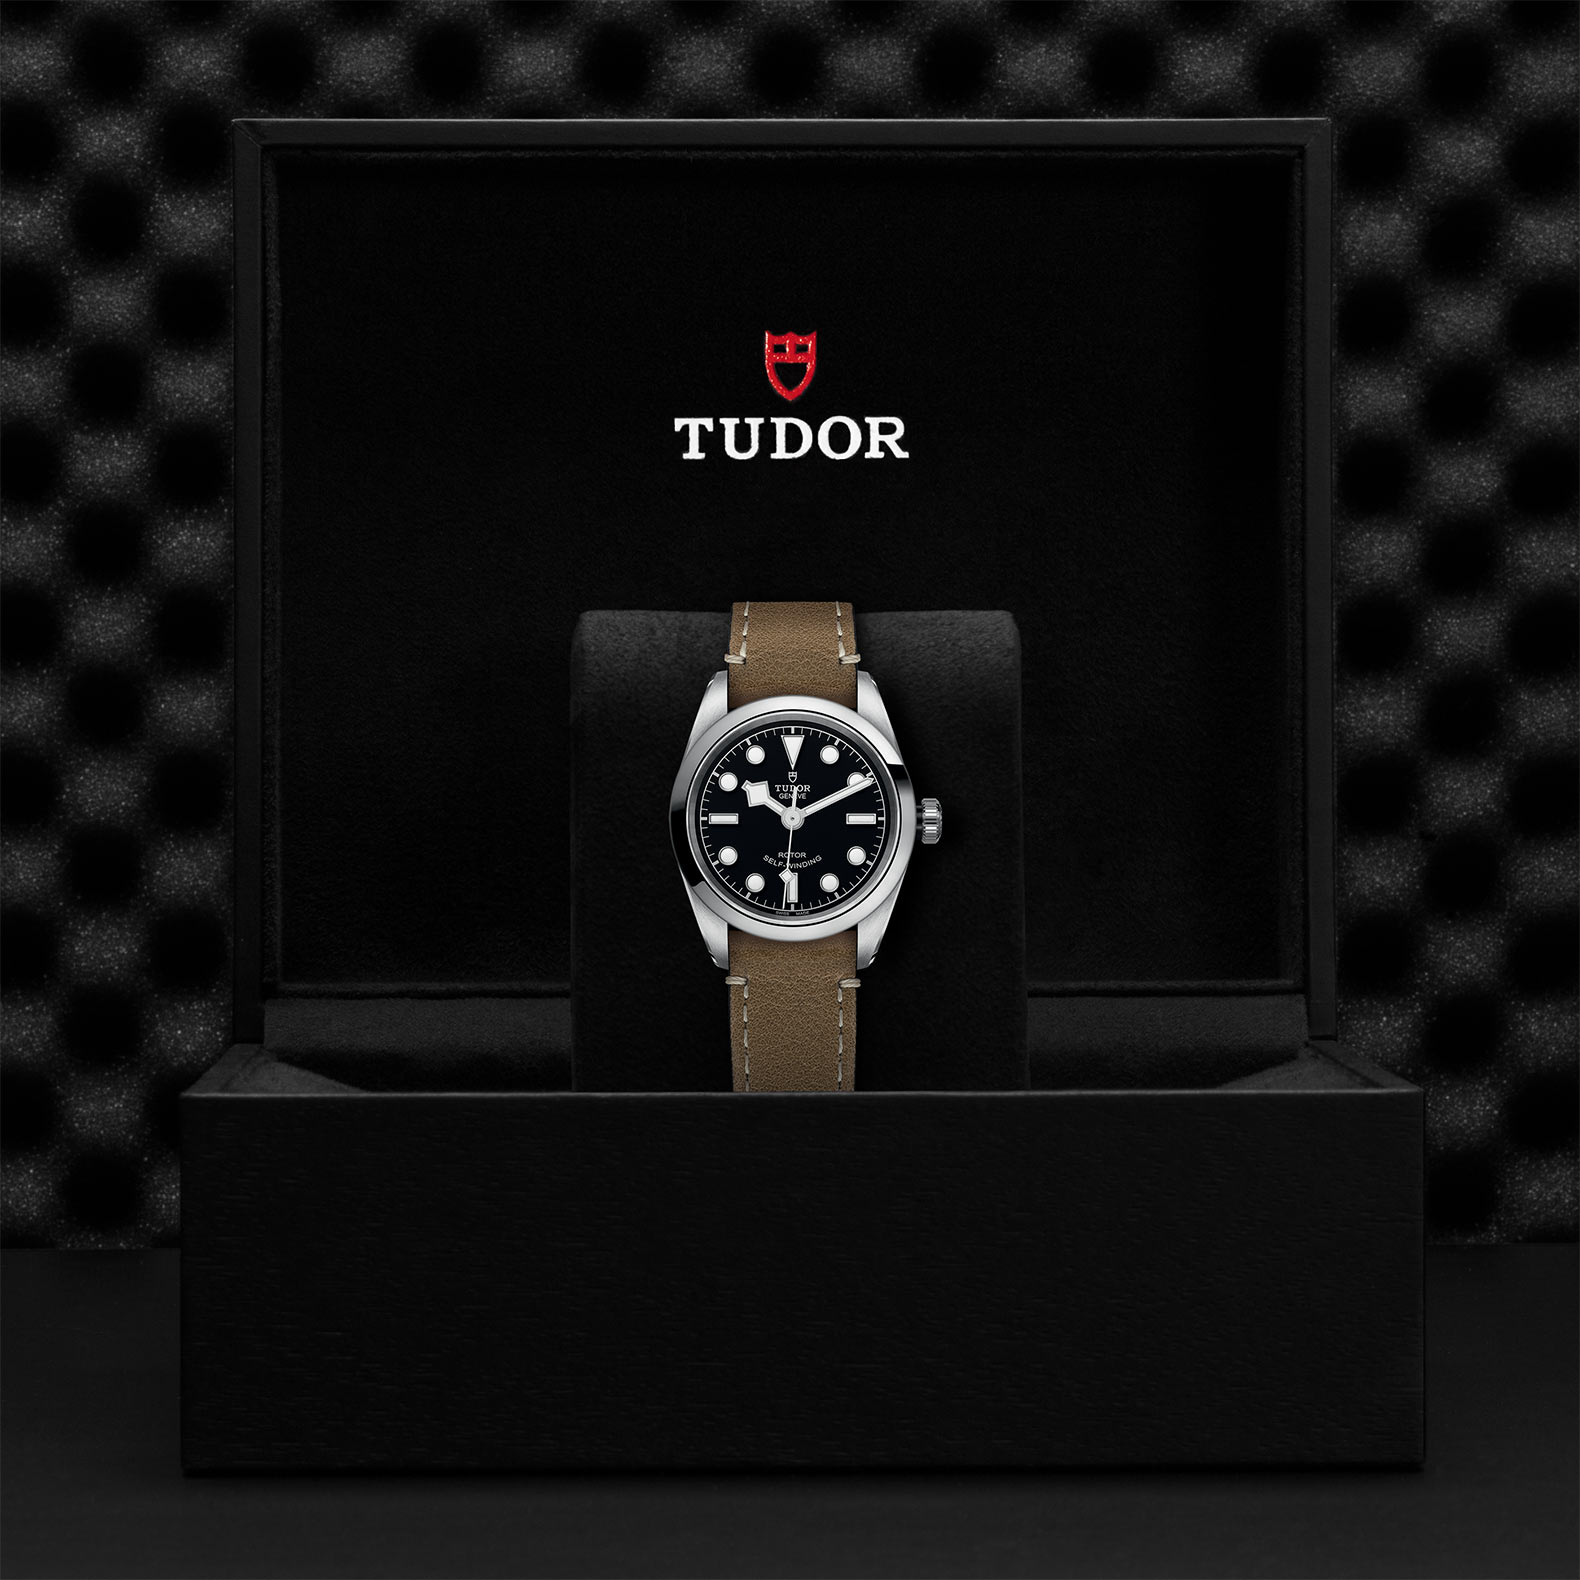 TUDOR Black Bay 32 M79580 0002 Presentation